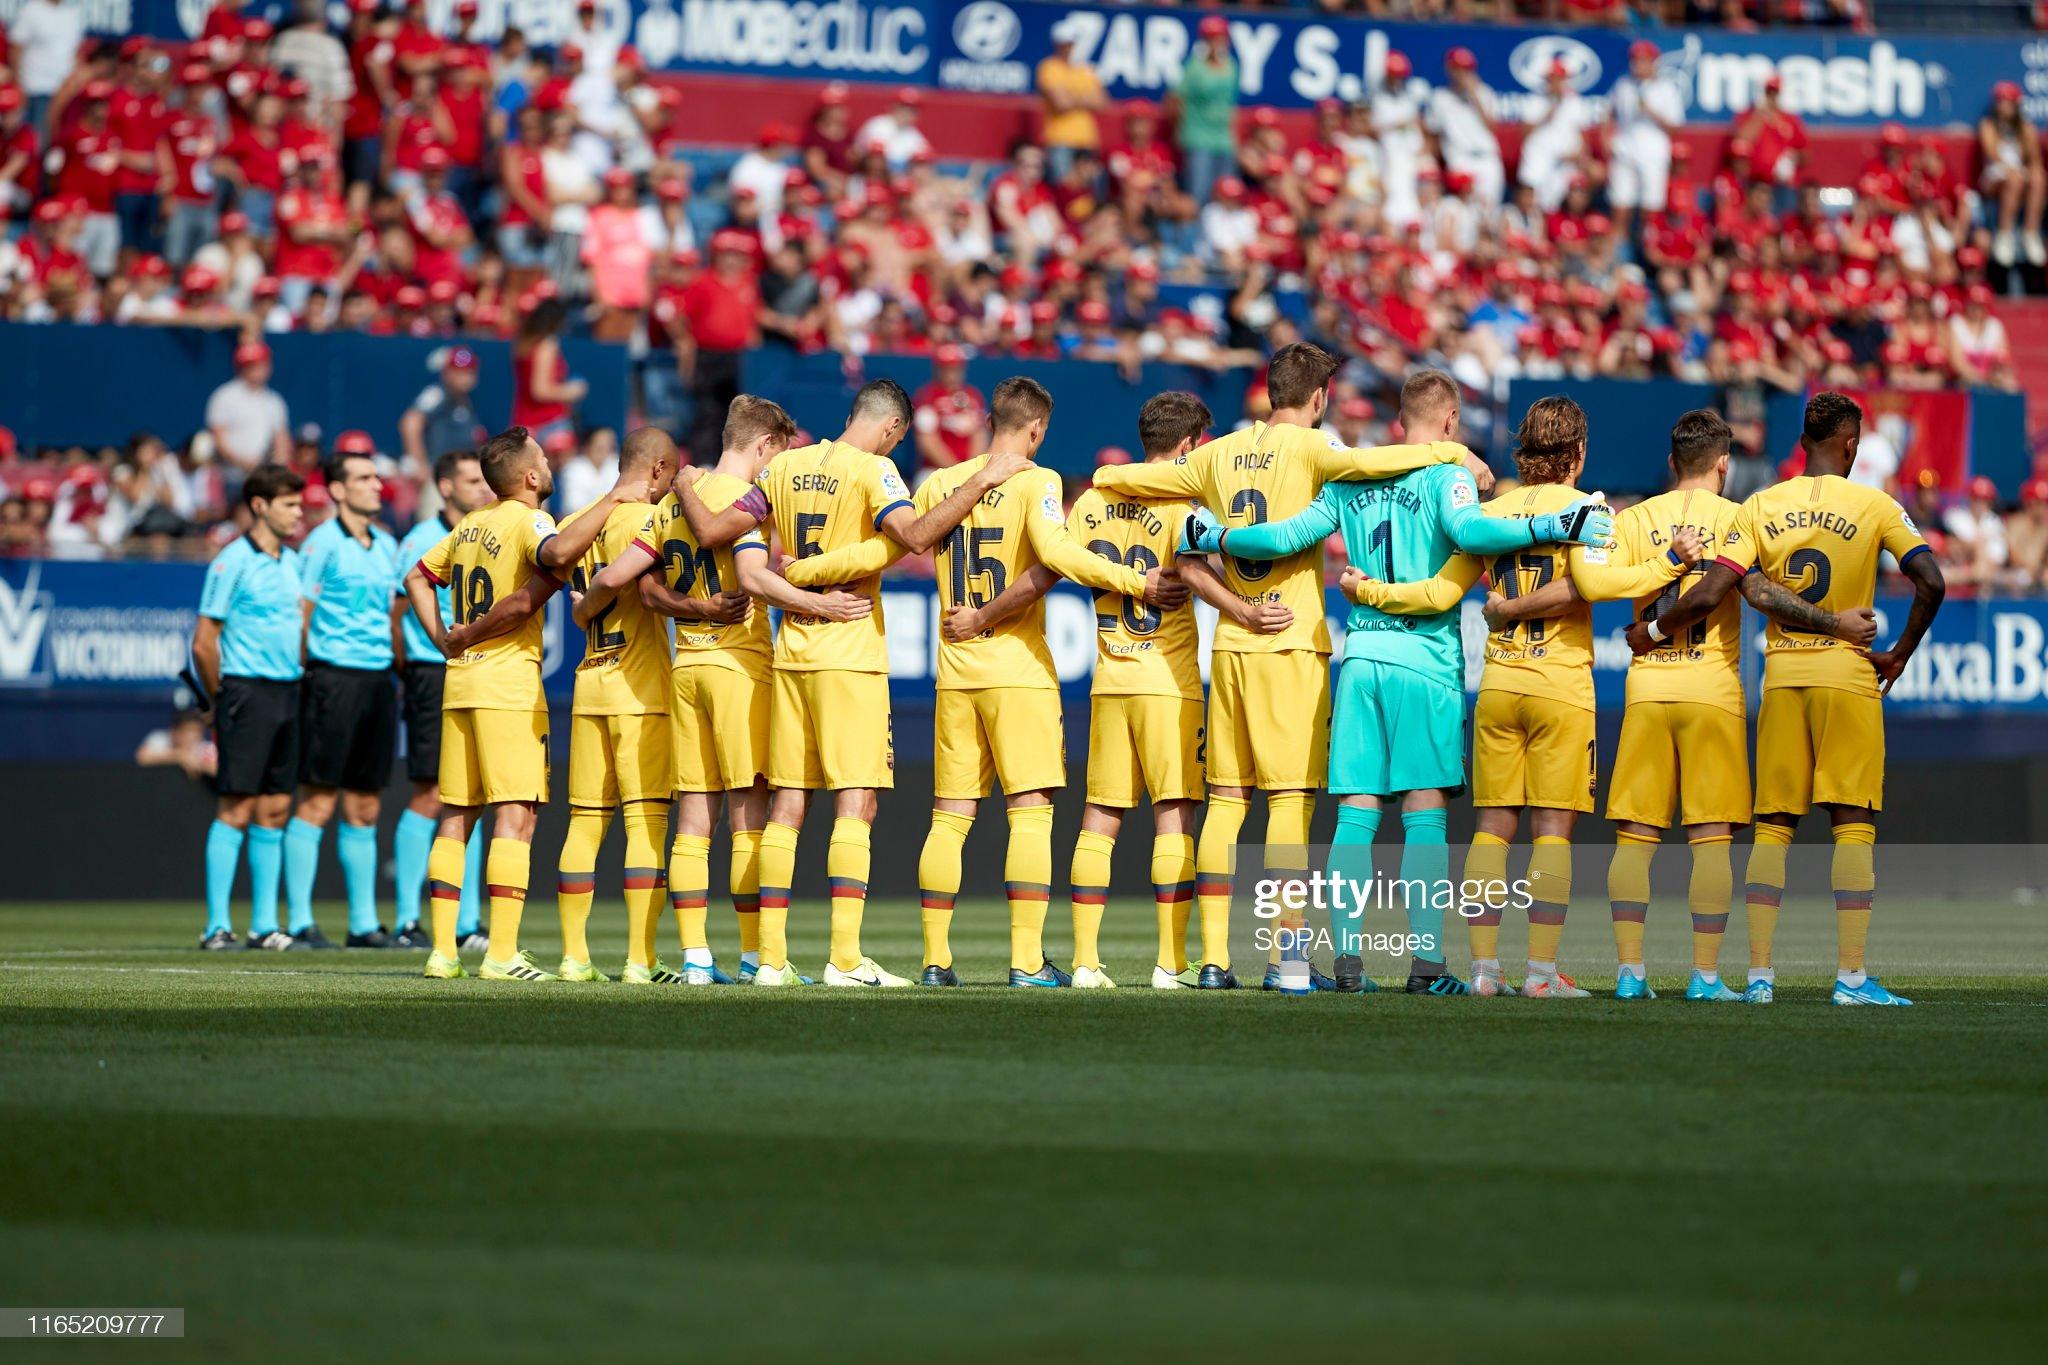 صور مباراة : أوساسونا - برشلونة 2-2 ( 31-08-2019 )  Barcelona-team-in-the-minute-of-silence-by-luis-enrique-after-the-la-picture-id1165209777?s=2048x2048